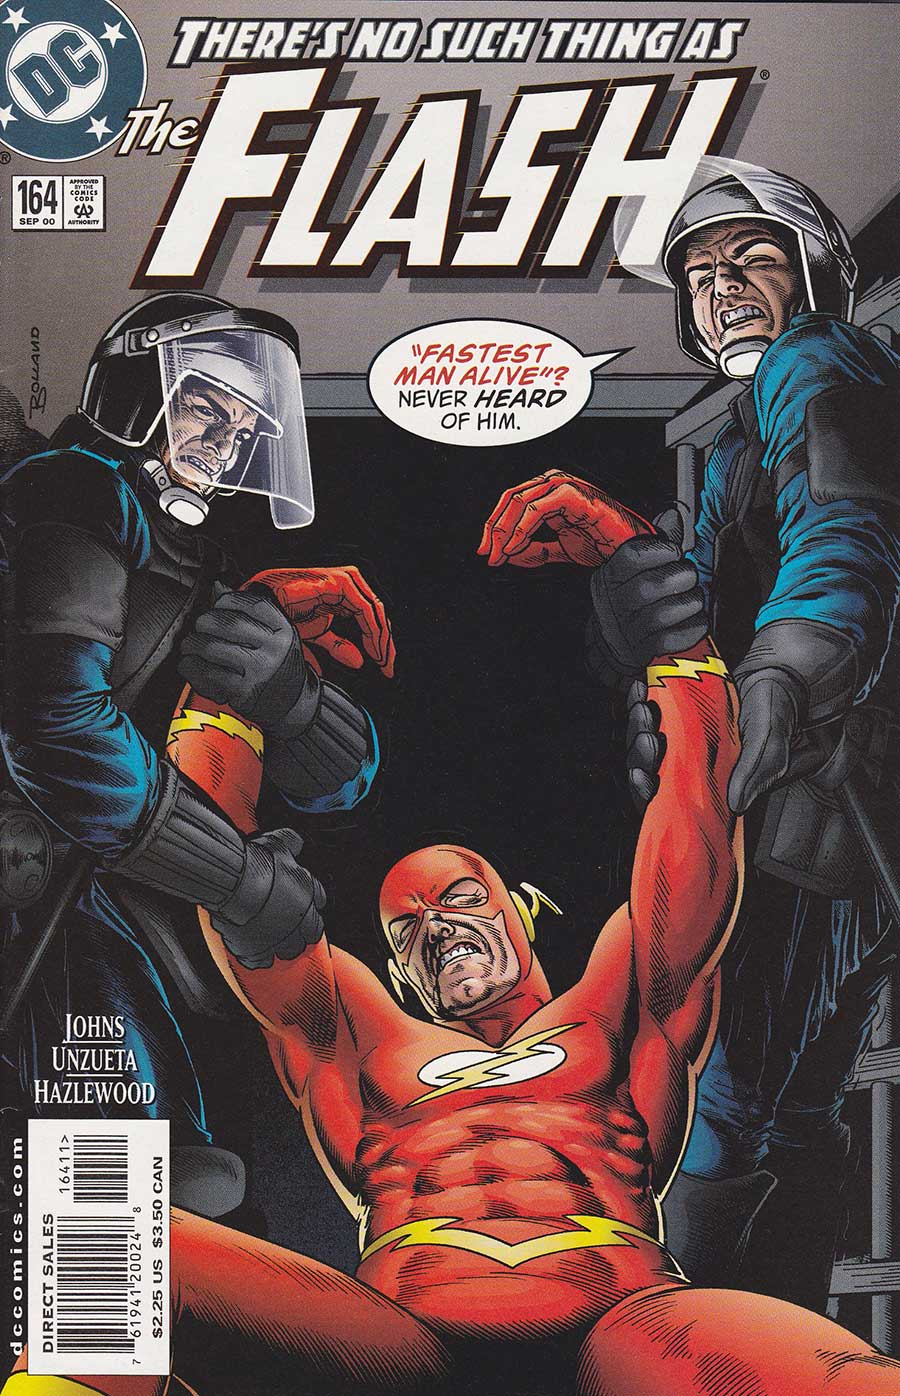 The Flash (Geoff Johns)